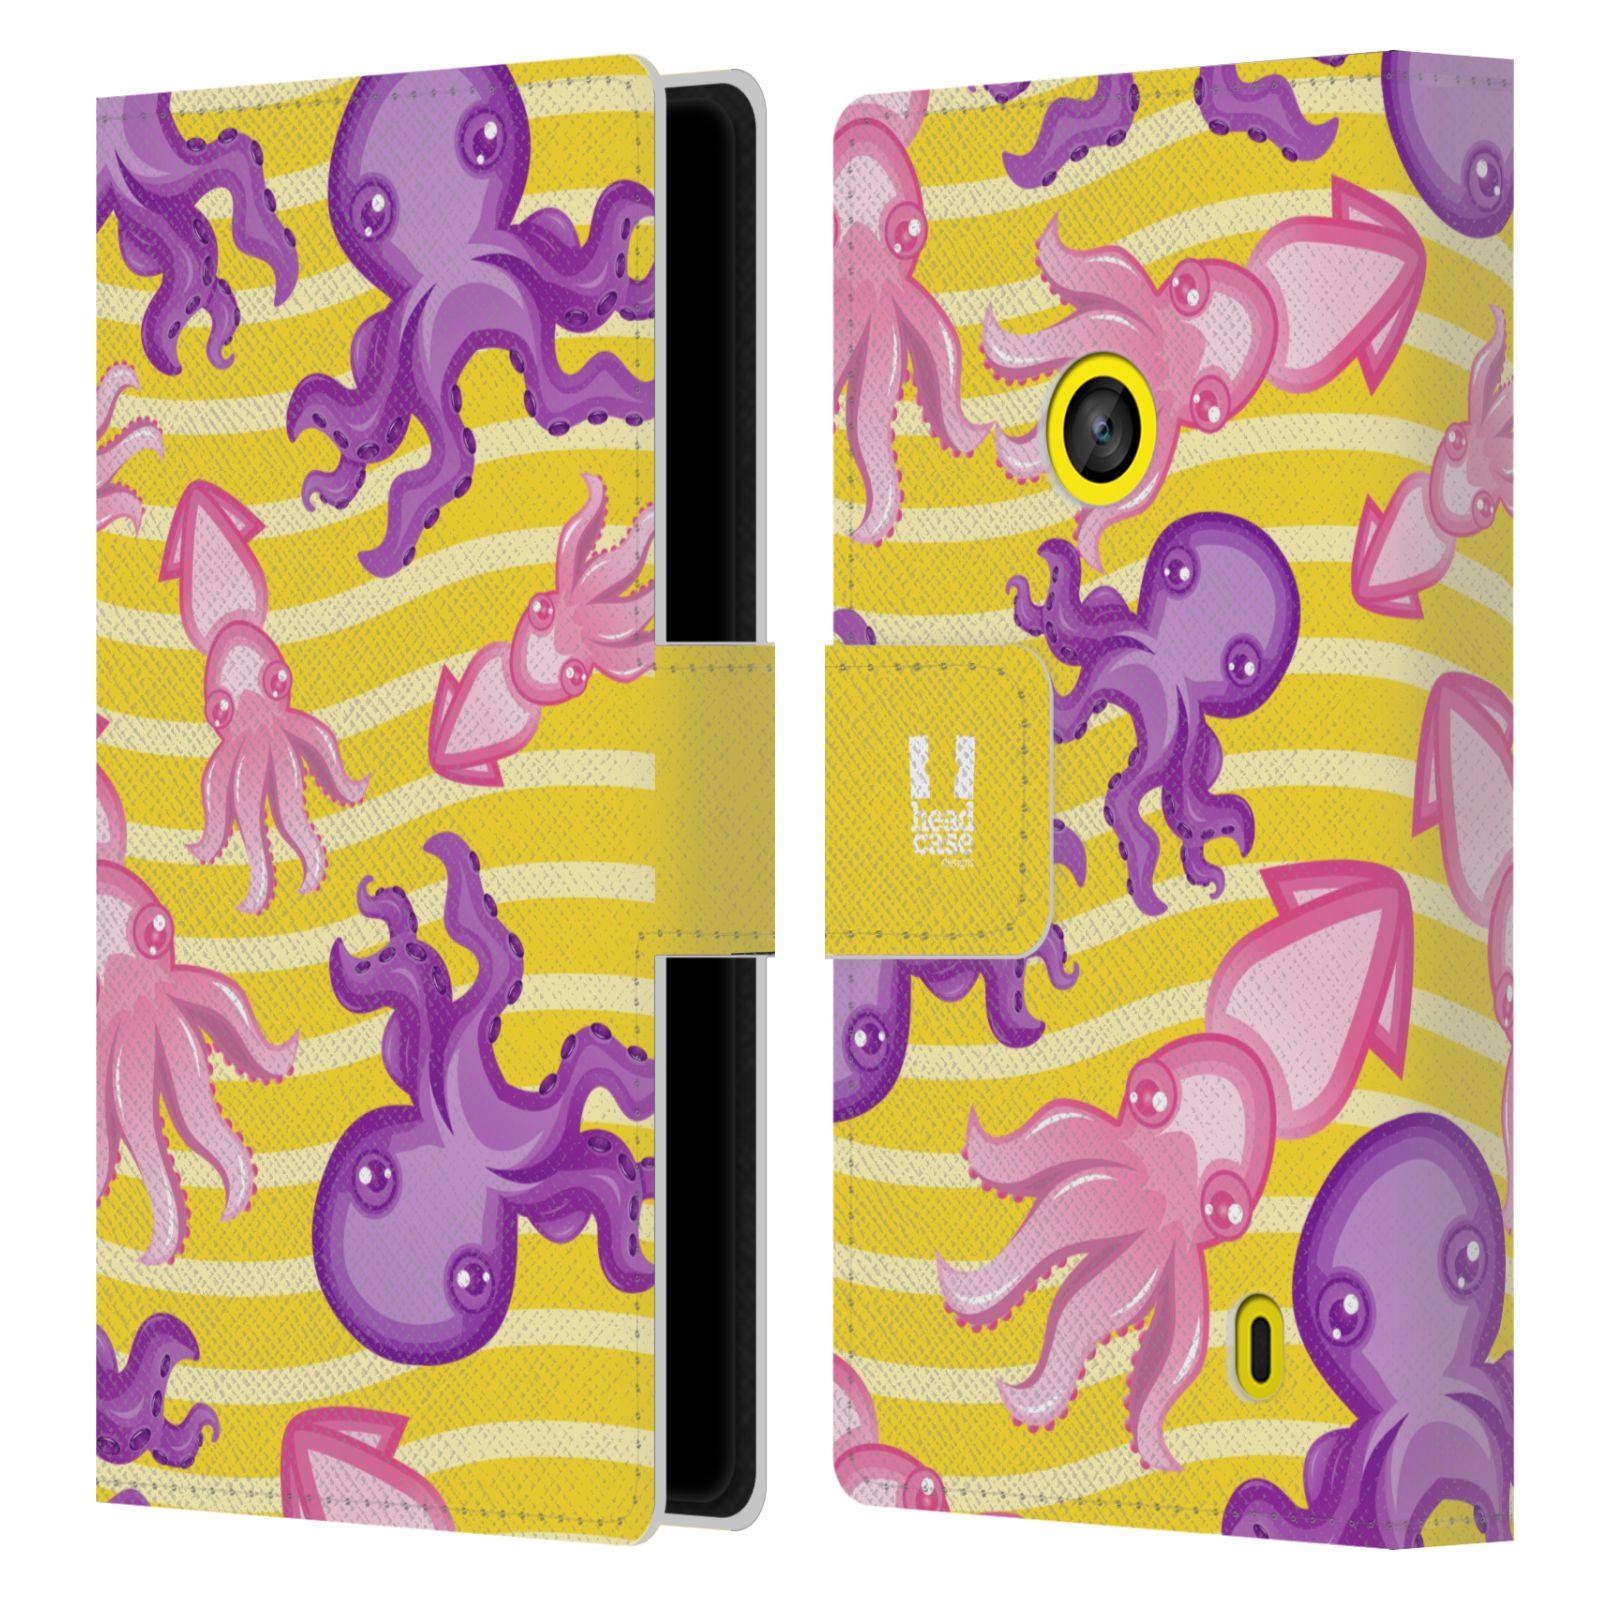 HEAD CASE Flipové pouzdro pro mobil NOKIA LUMIA 520 / 525 Mořský živočich chobotnice a krakatice žlutá barva